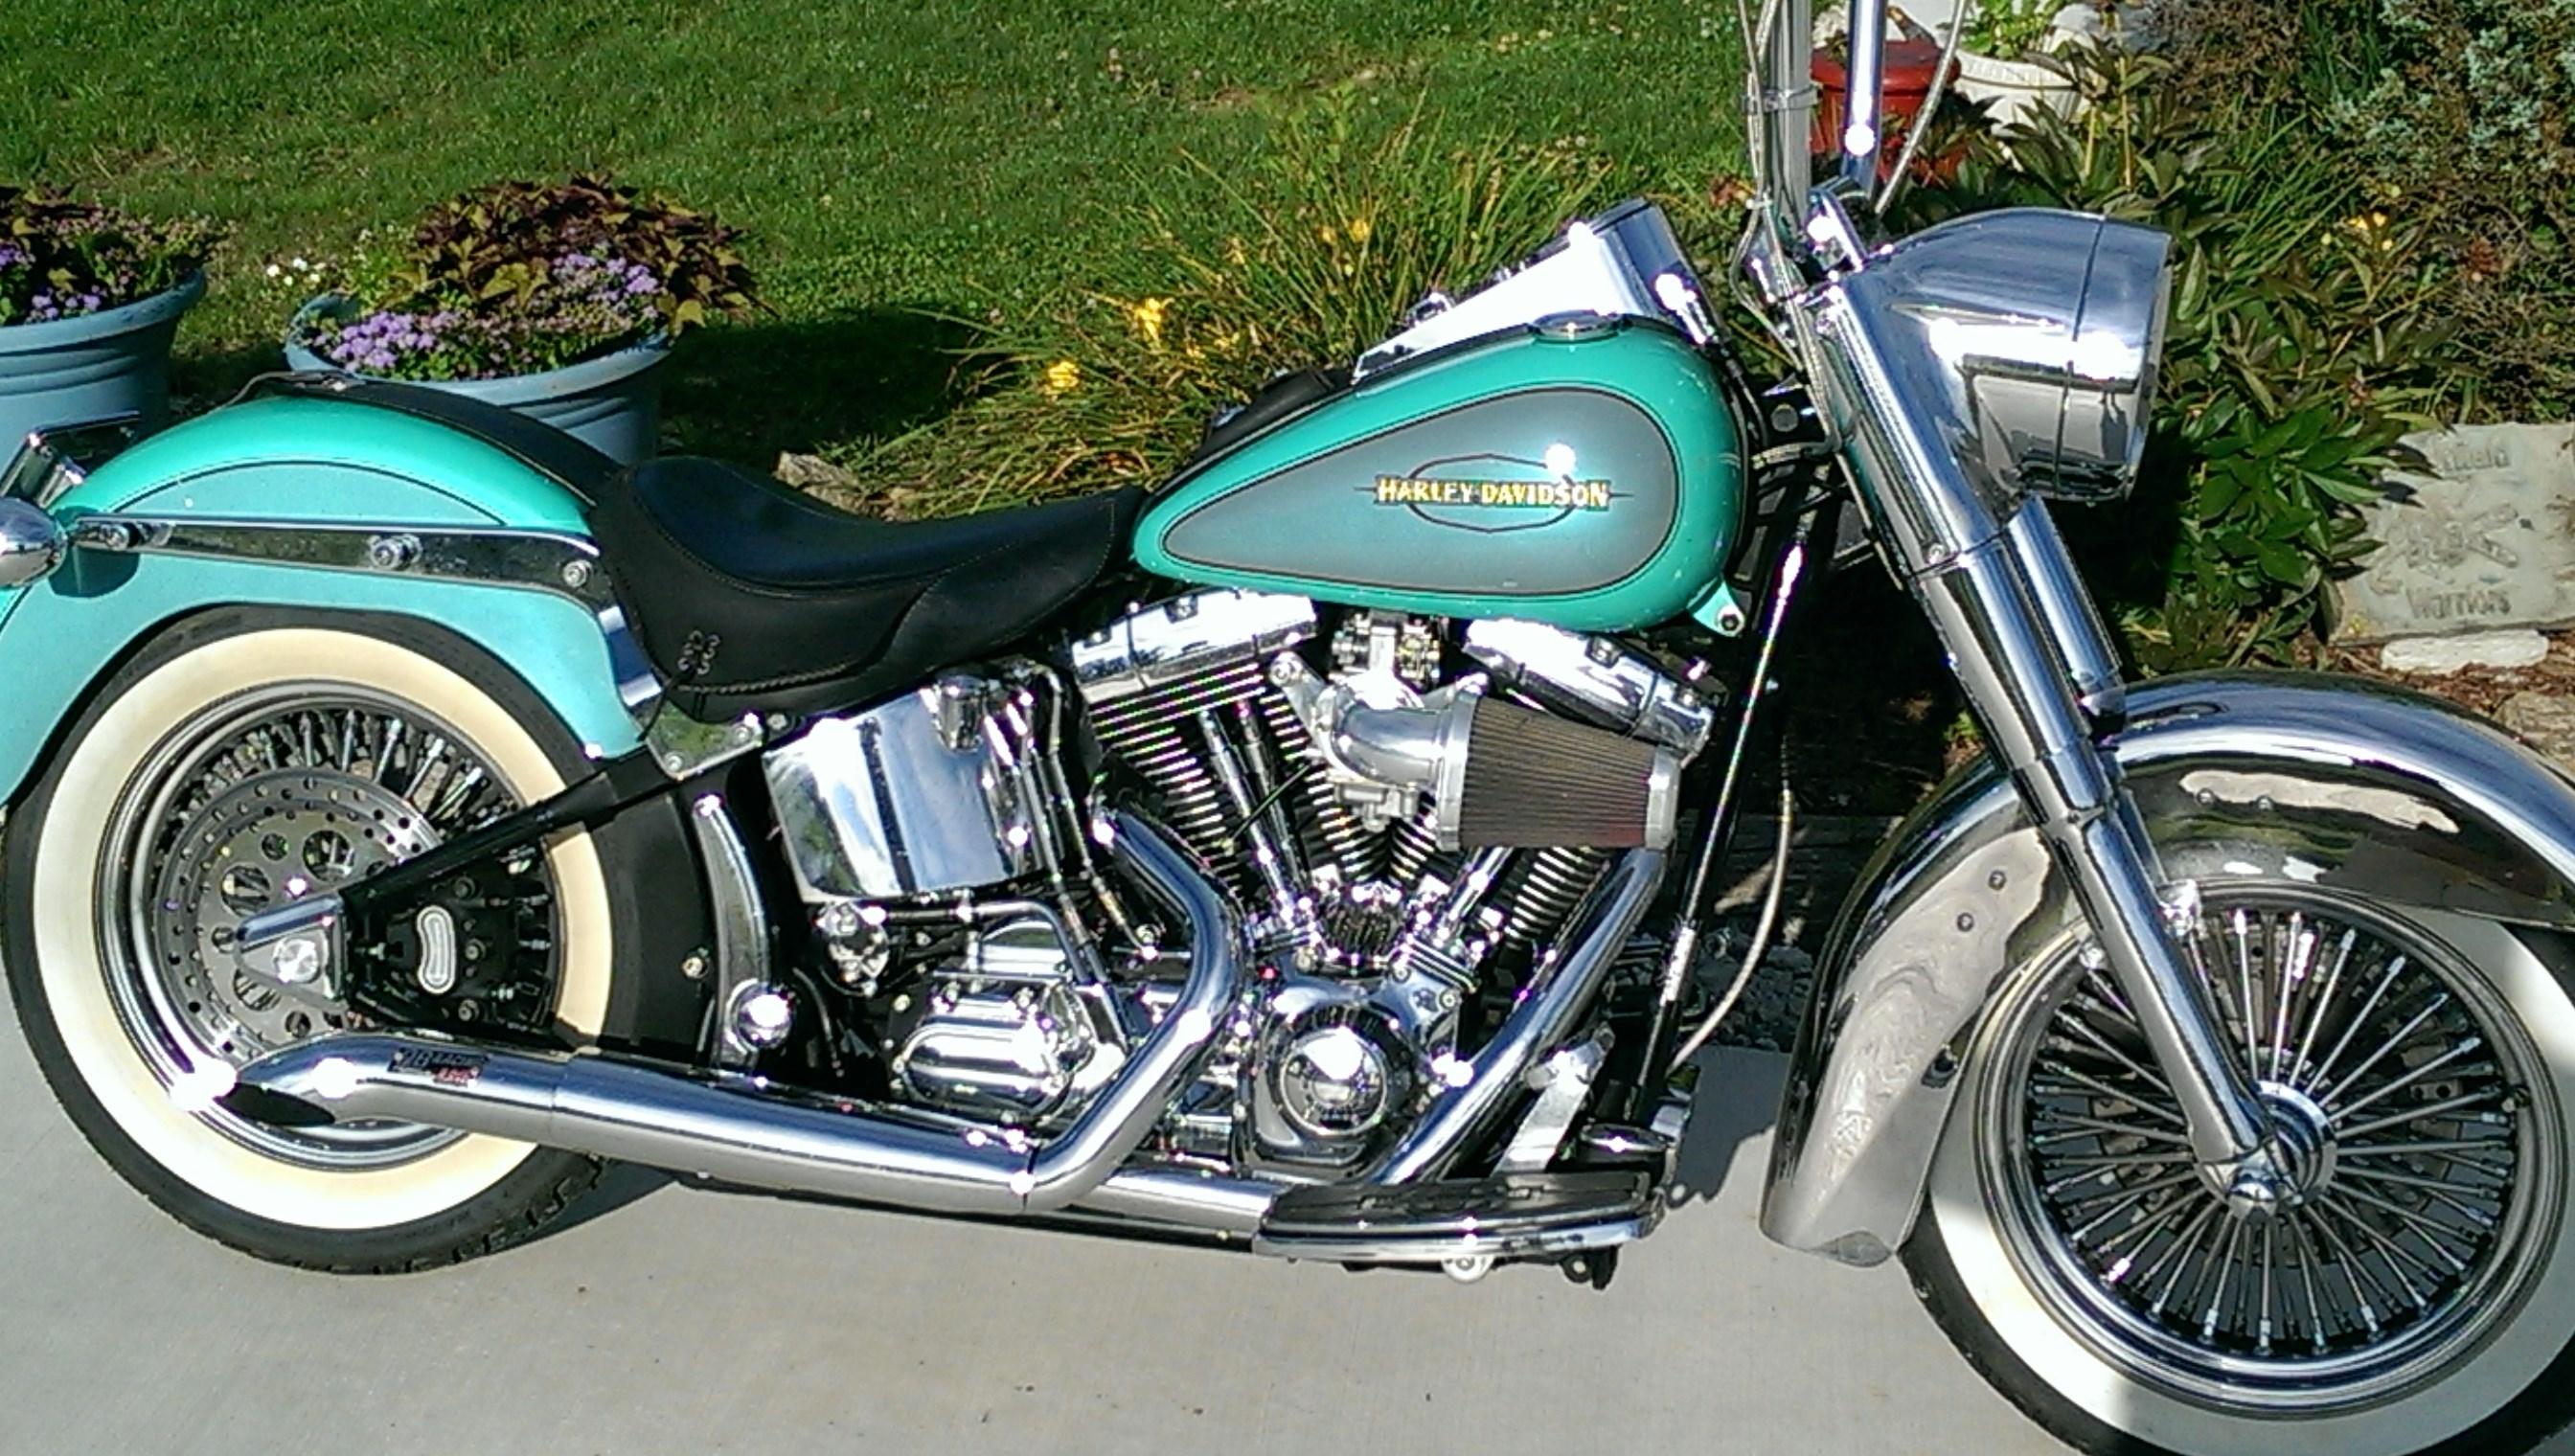 2000 Harley Davidson 174 Flstf Softail 174 Fat Boy 174 Turquoise